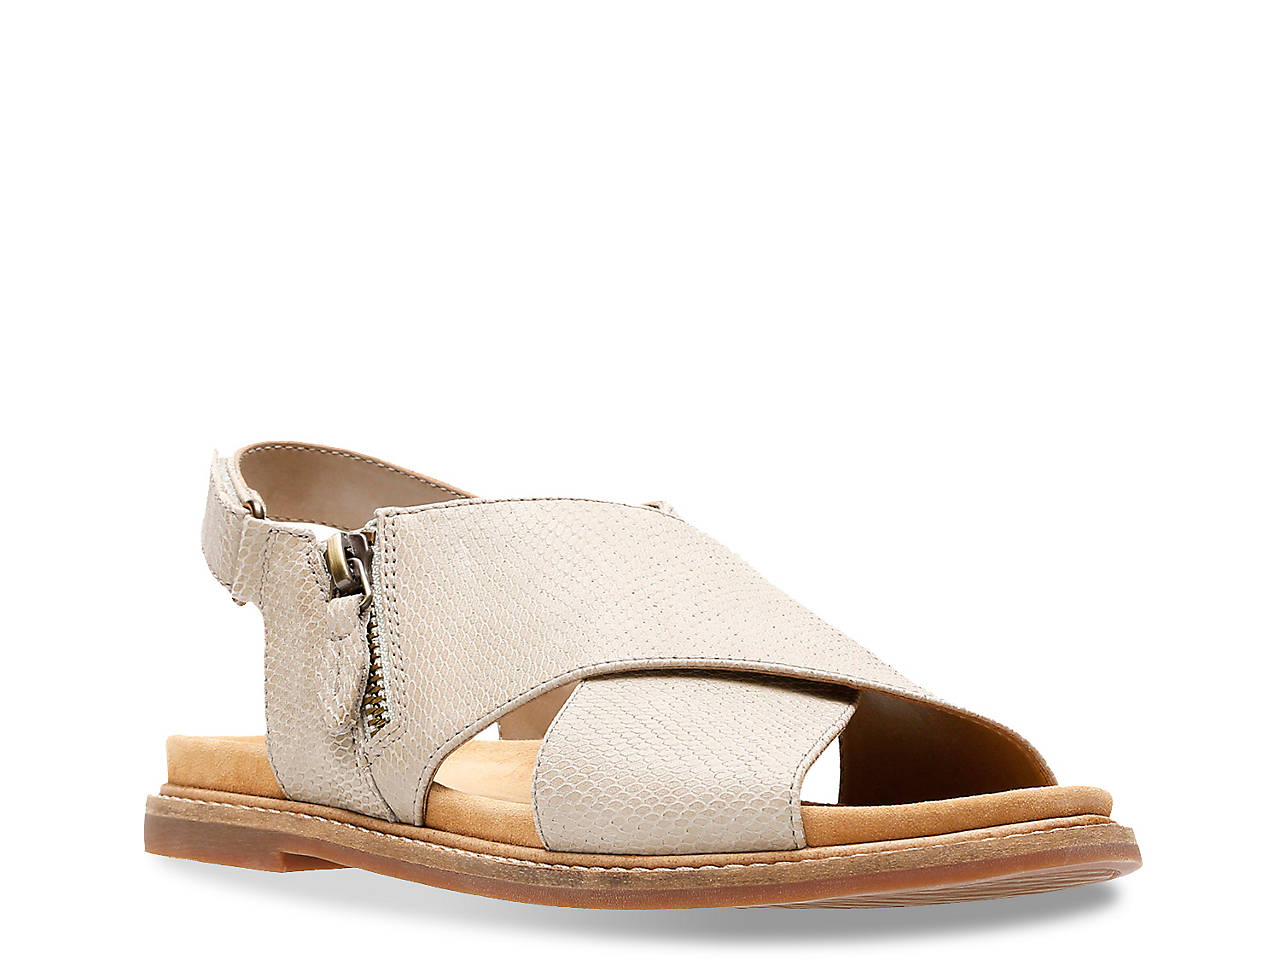 Coriso Calm Sandal by Clarks